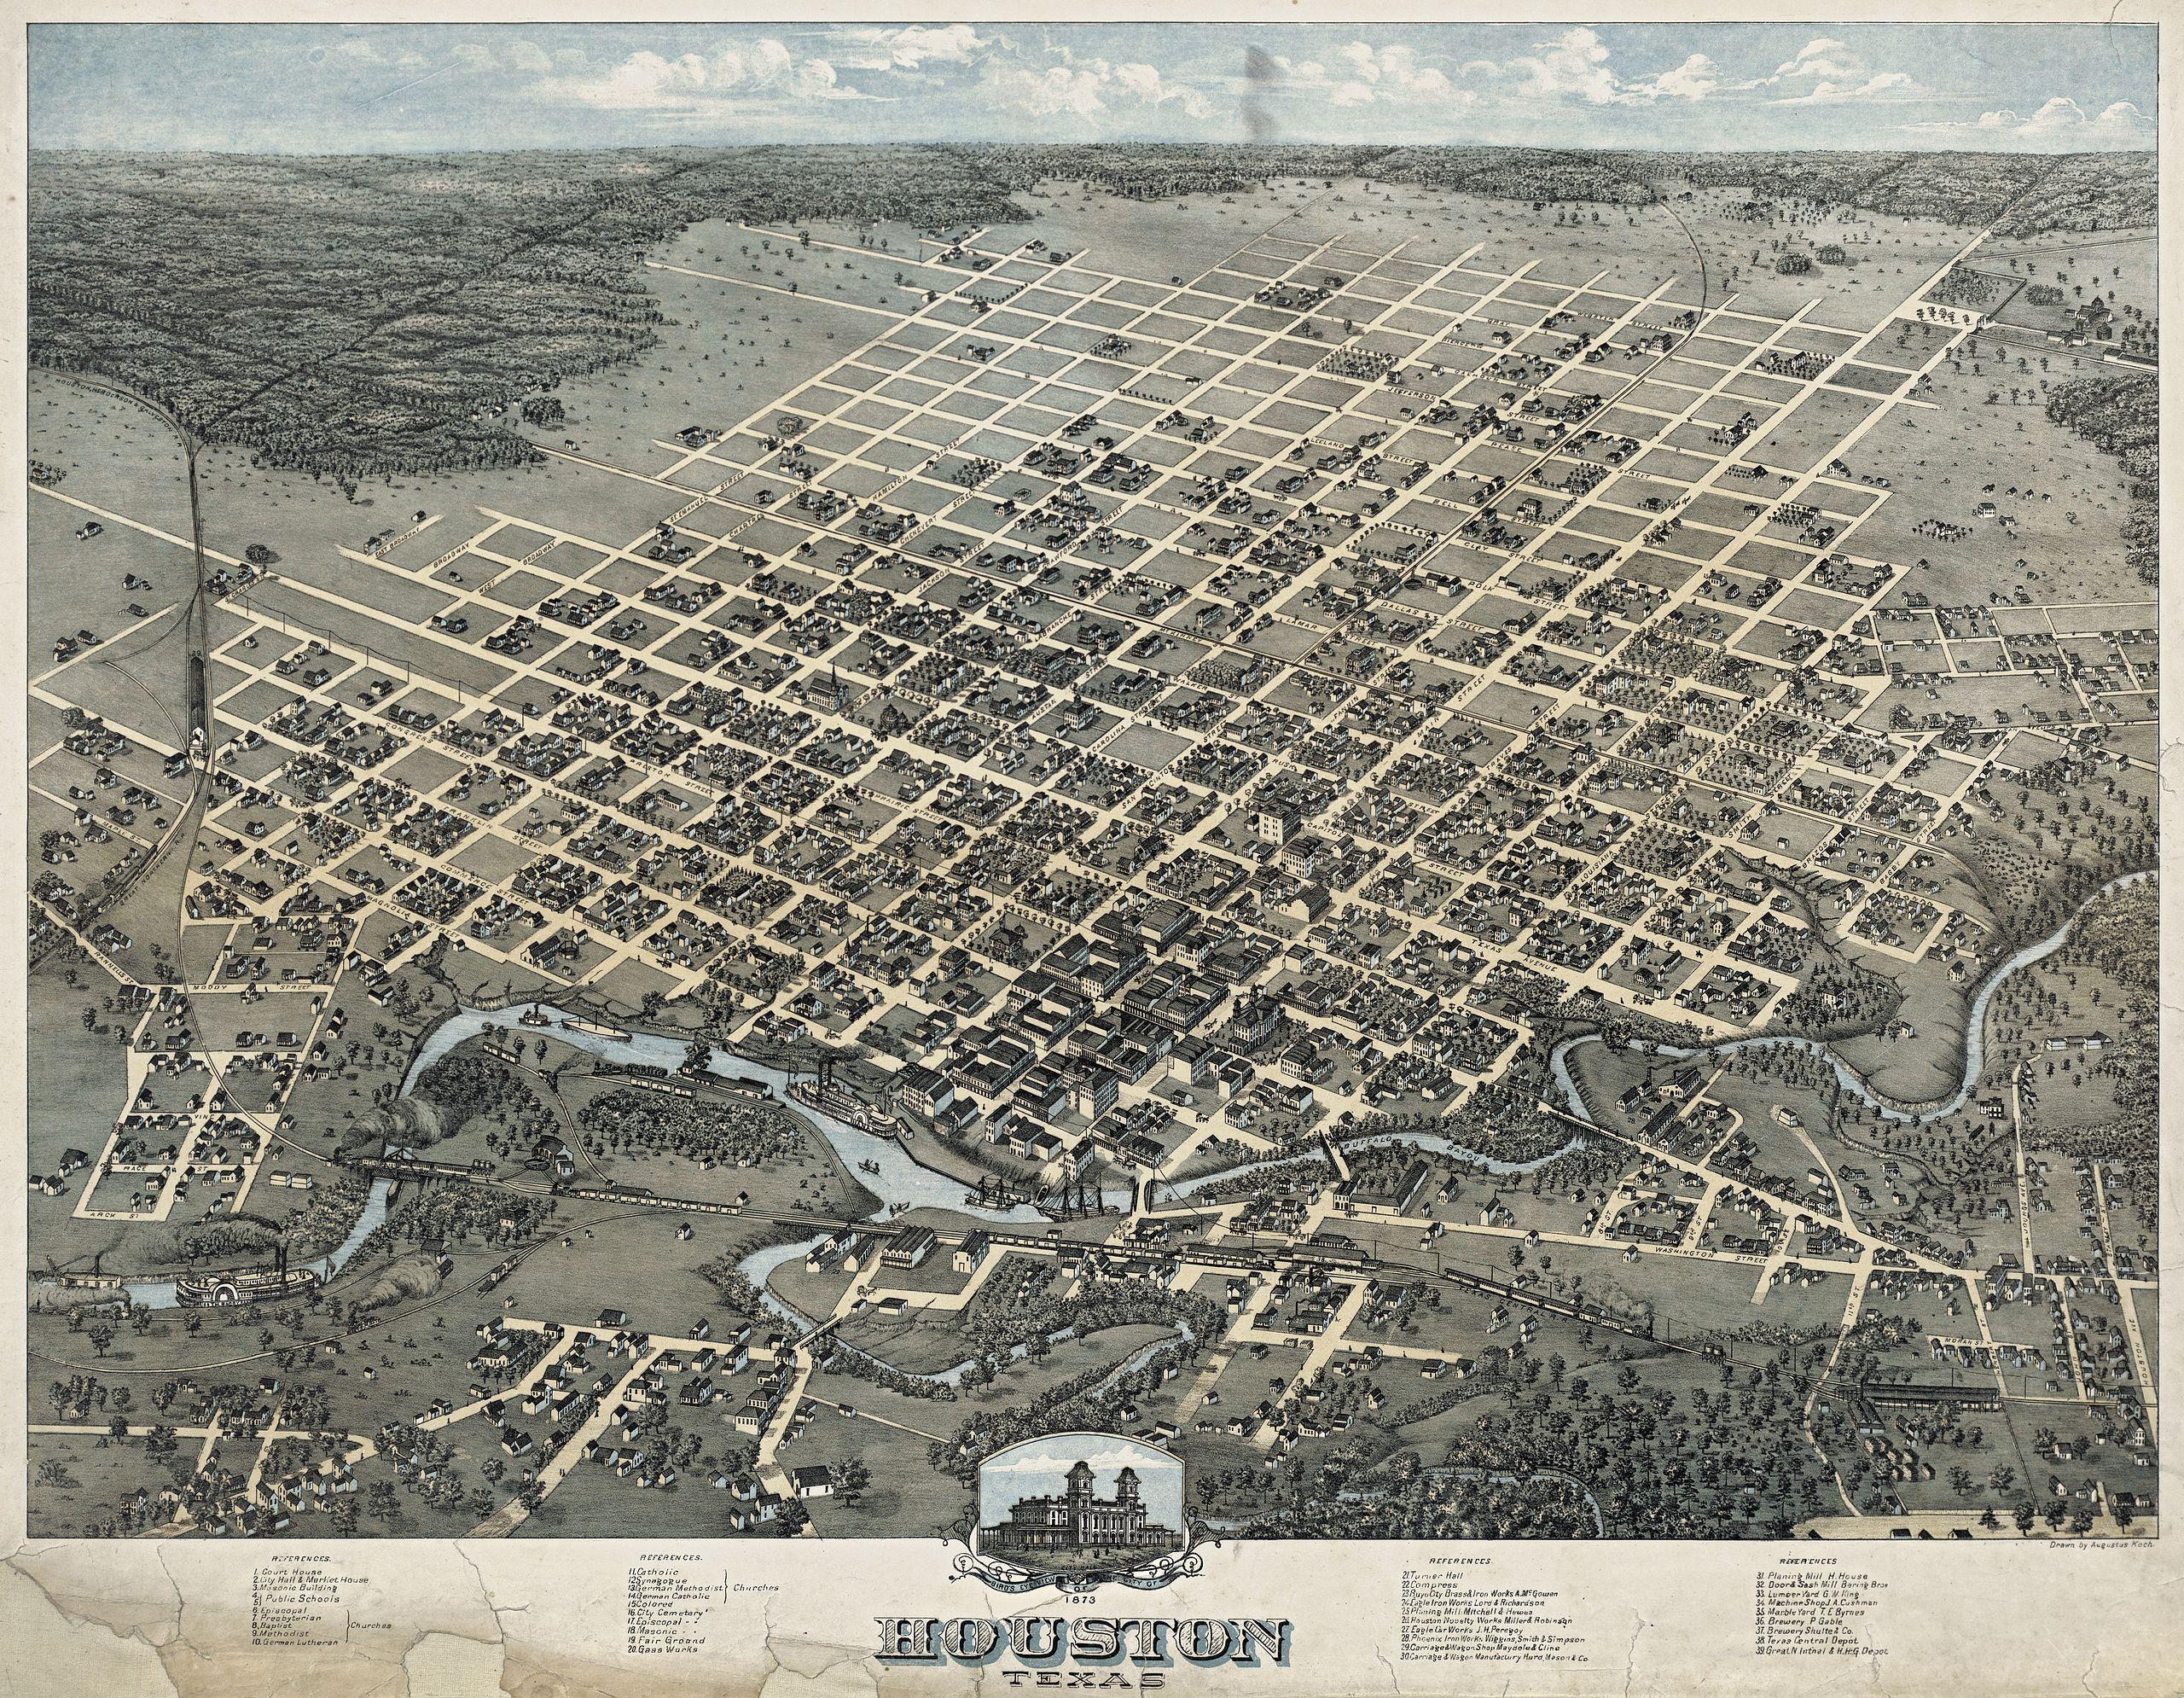 File:Old map-Houston-1873.jpg - Wikimedia Commons